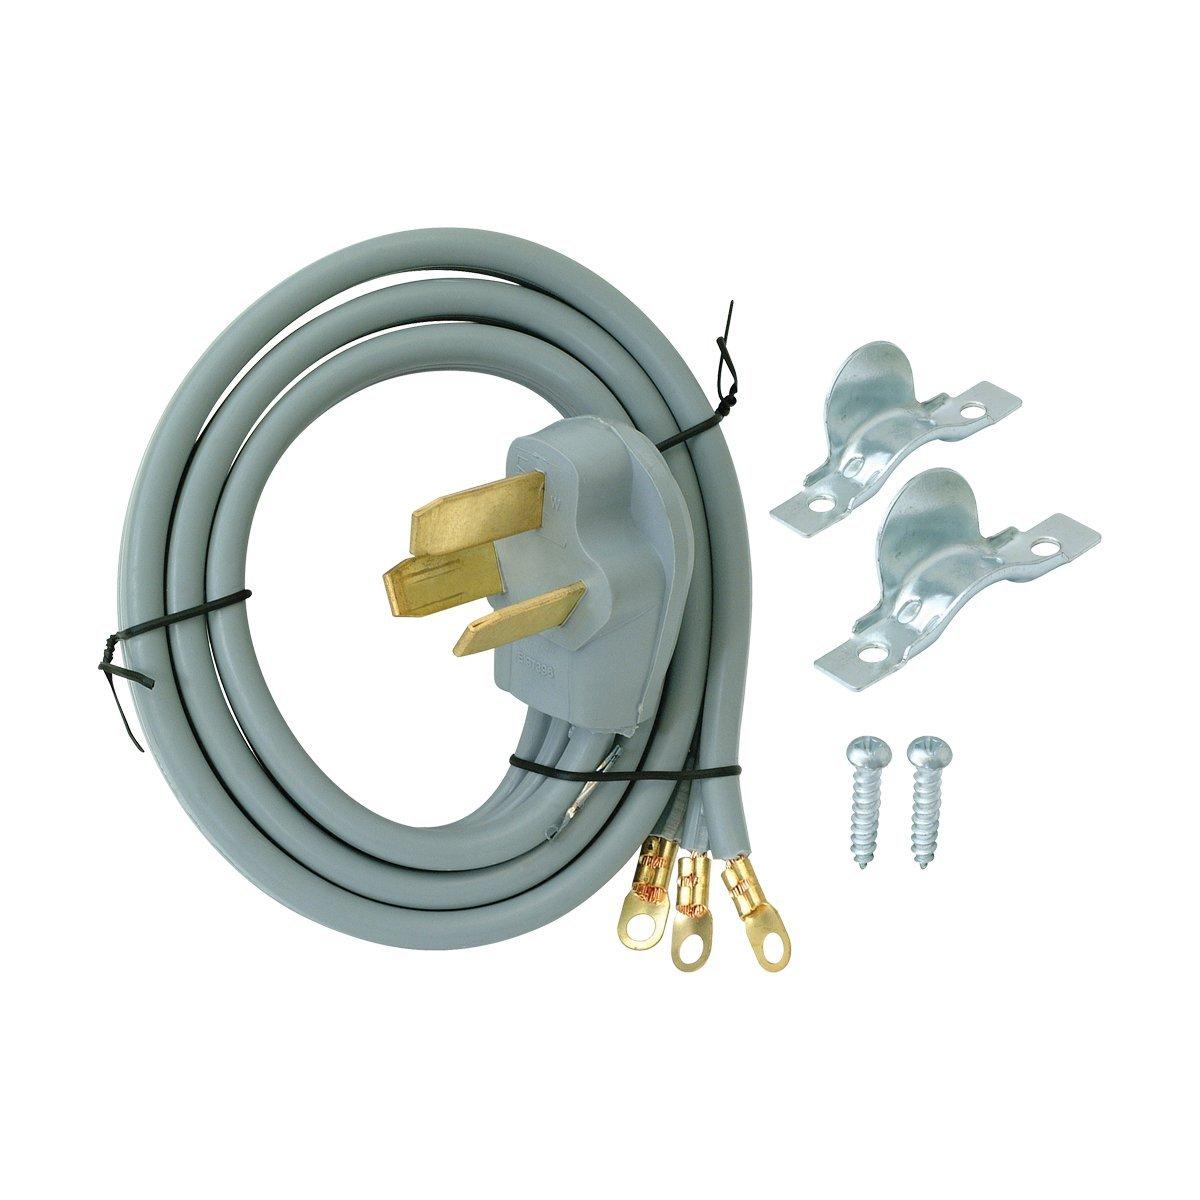 10-3 Wire 10/' EZ-FLO 61244 3-Prong Range Cord-50 AMP 3 Wire